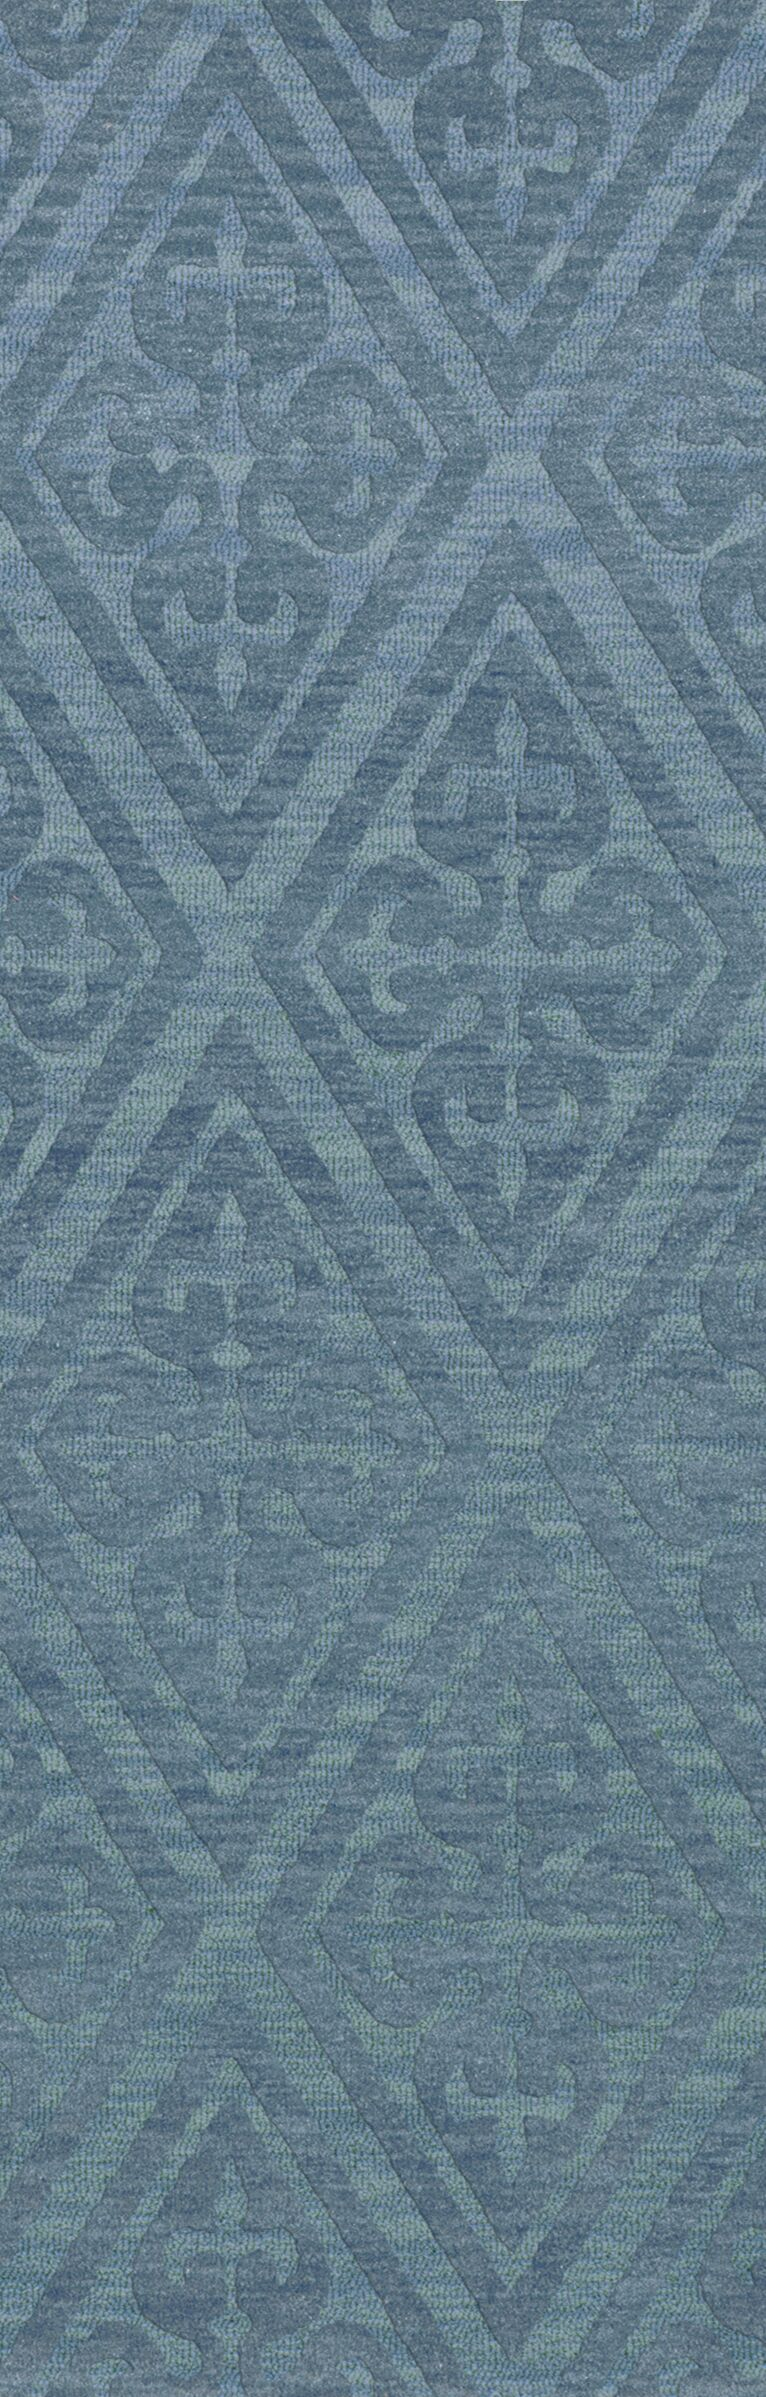 Bella Machine Woven Wool Blue Area Rug Rug Size: Runner 2'6